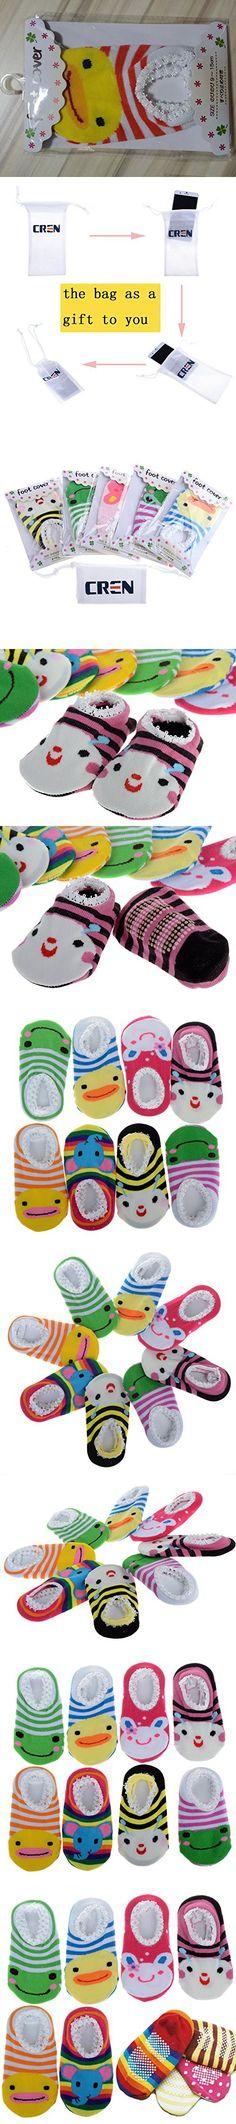 Cren® 5 Pairs Baby Toddler Anti Slip Skid Socks For Age 0-2, Length 9-15cm/3.54-5.9inch